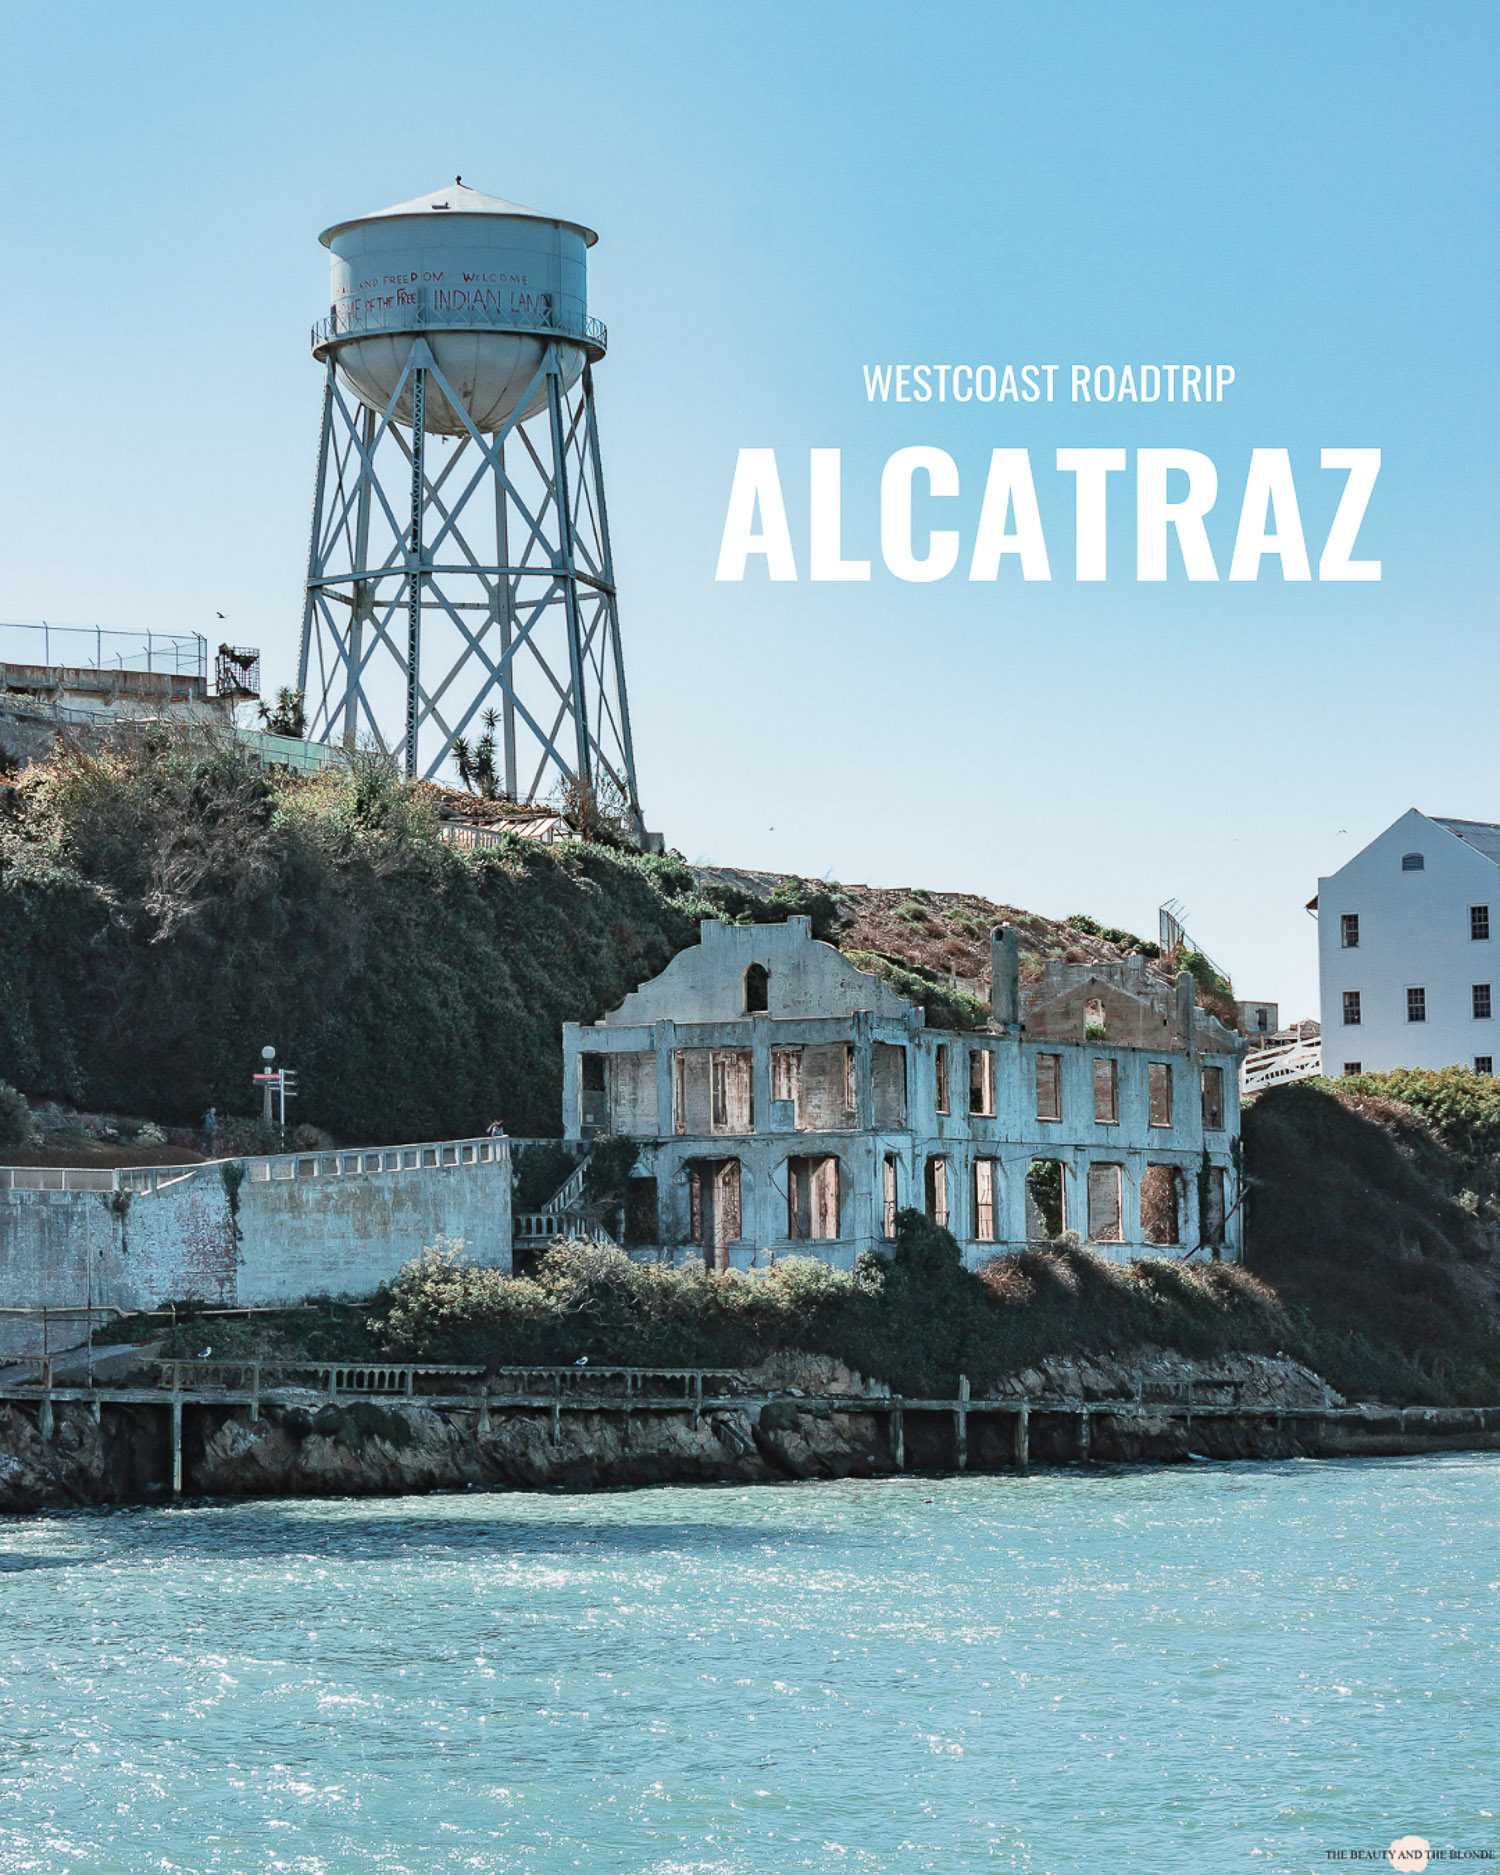 Alcatraz Westcoast Roadtrip Thumbnail